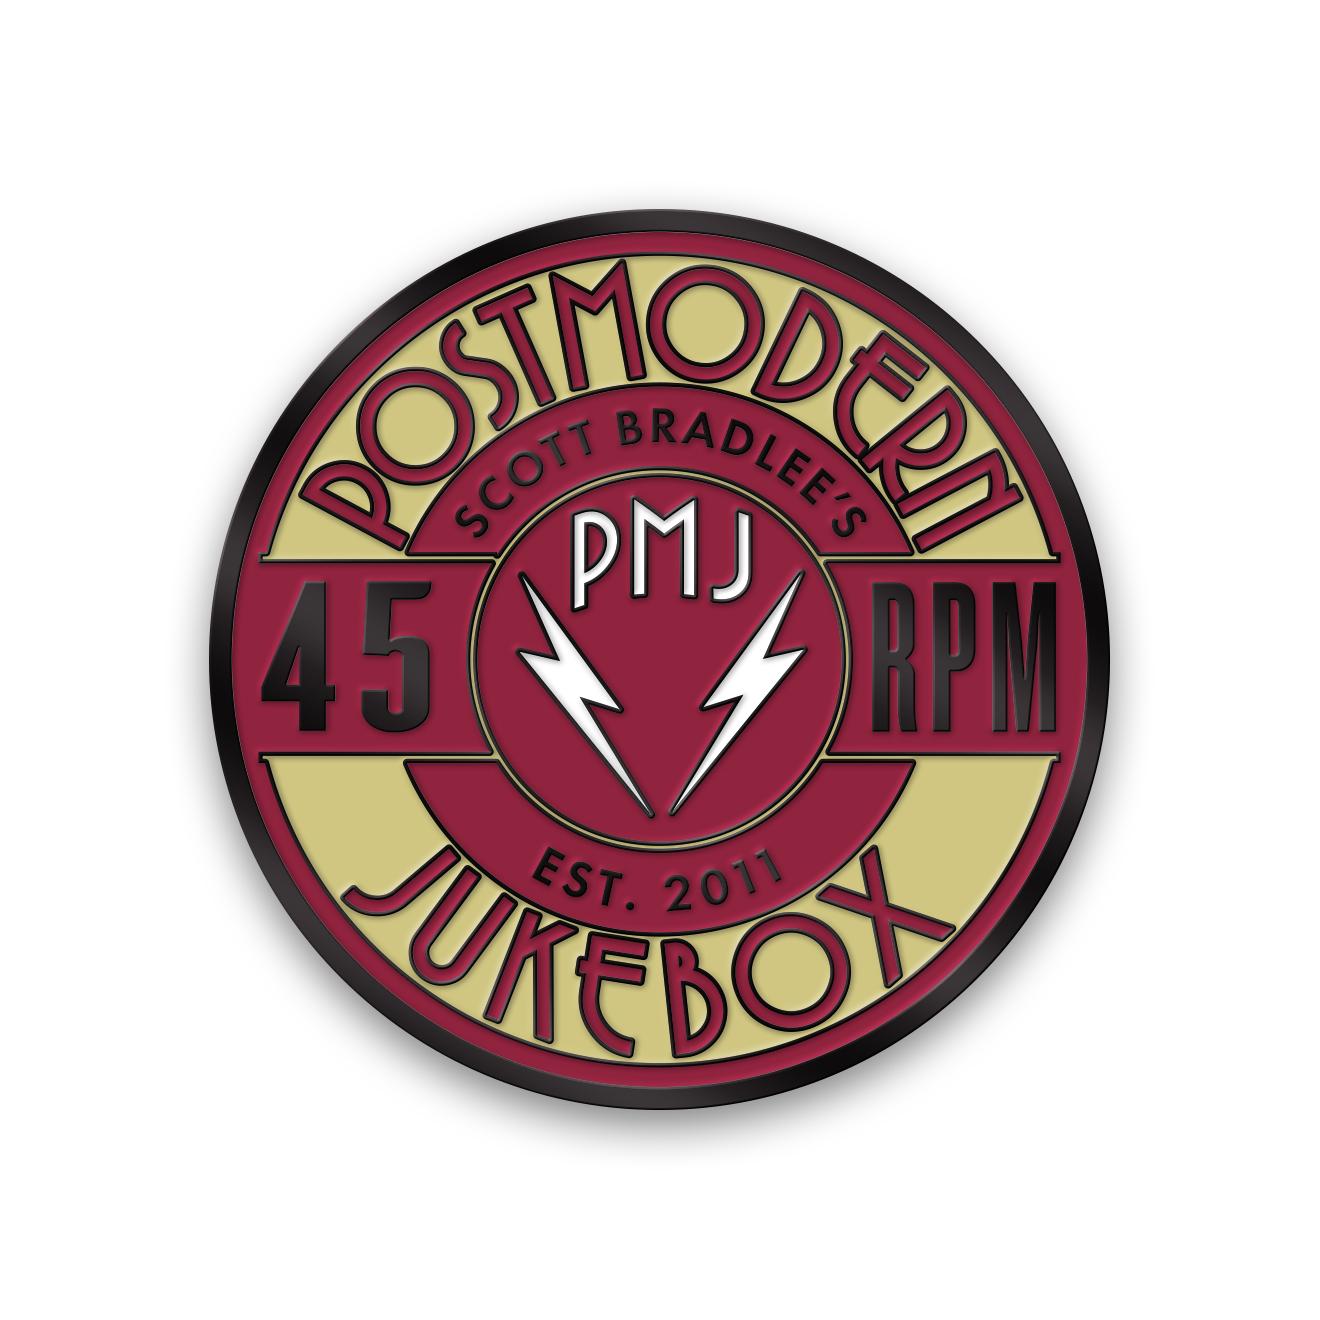 Postmodern 45 RPM Pin Enamel